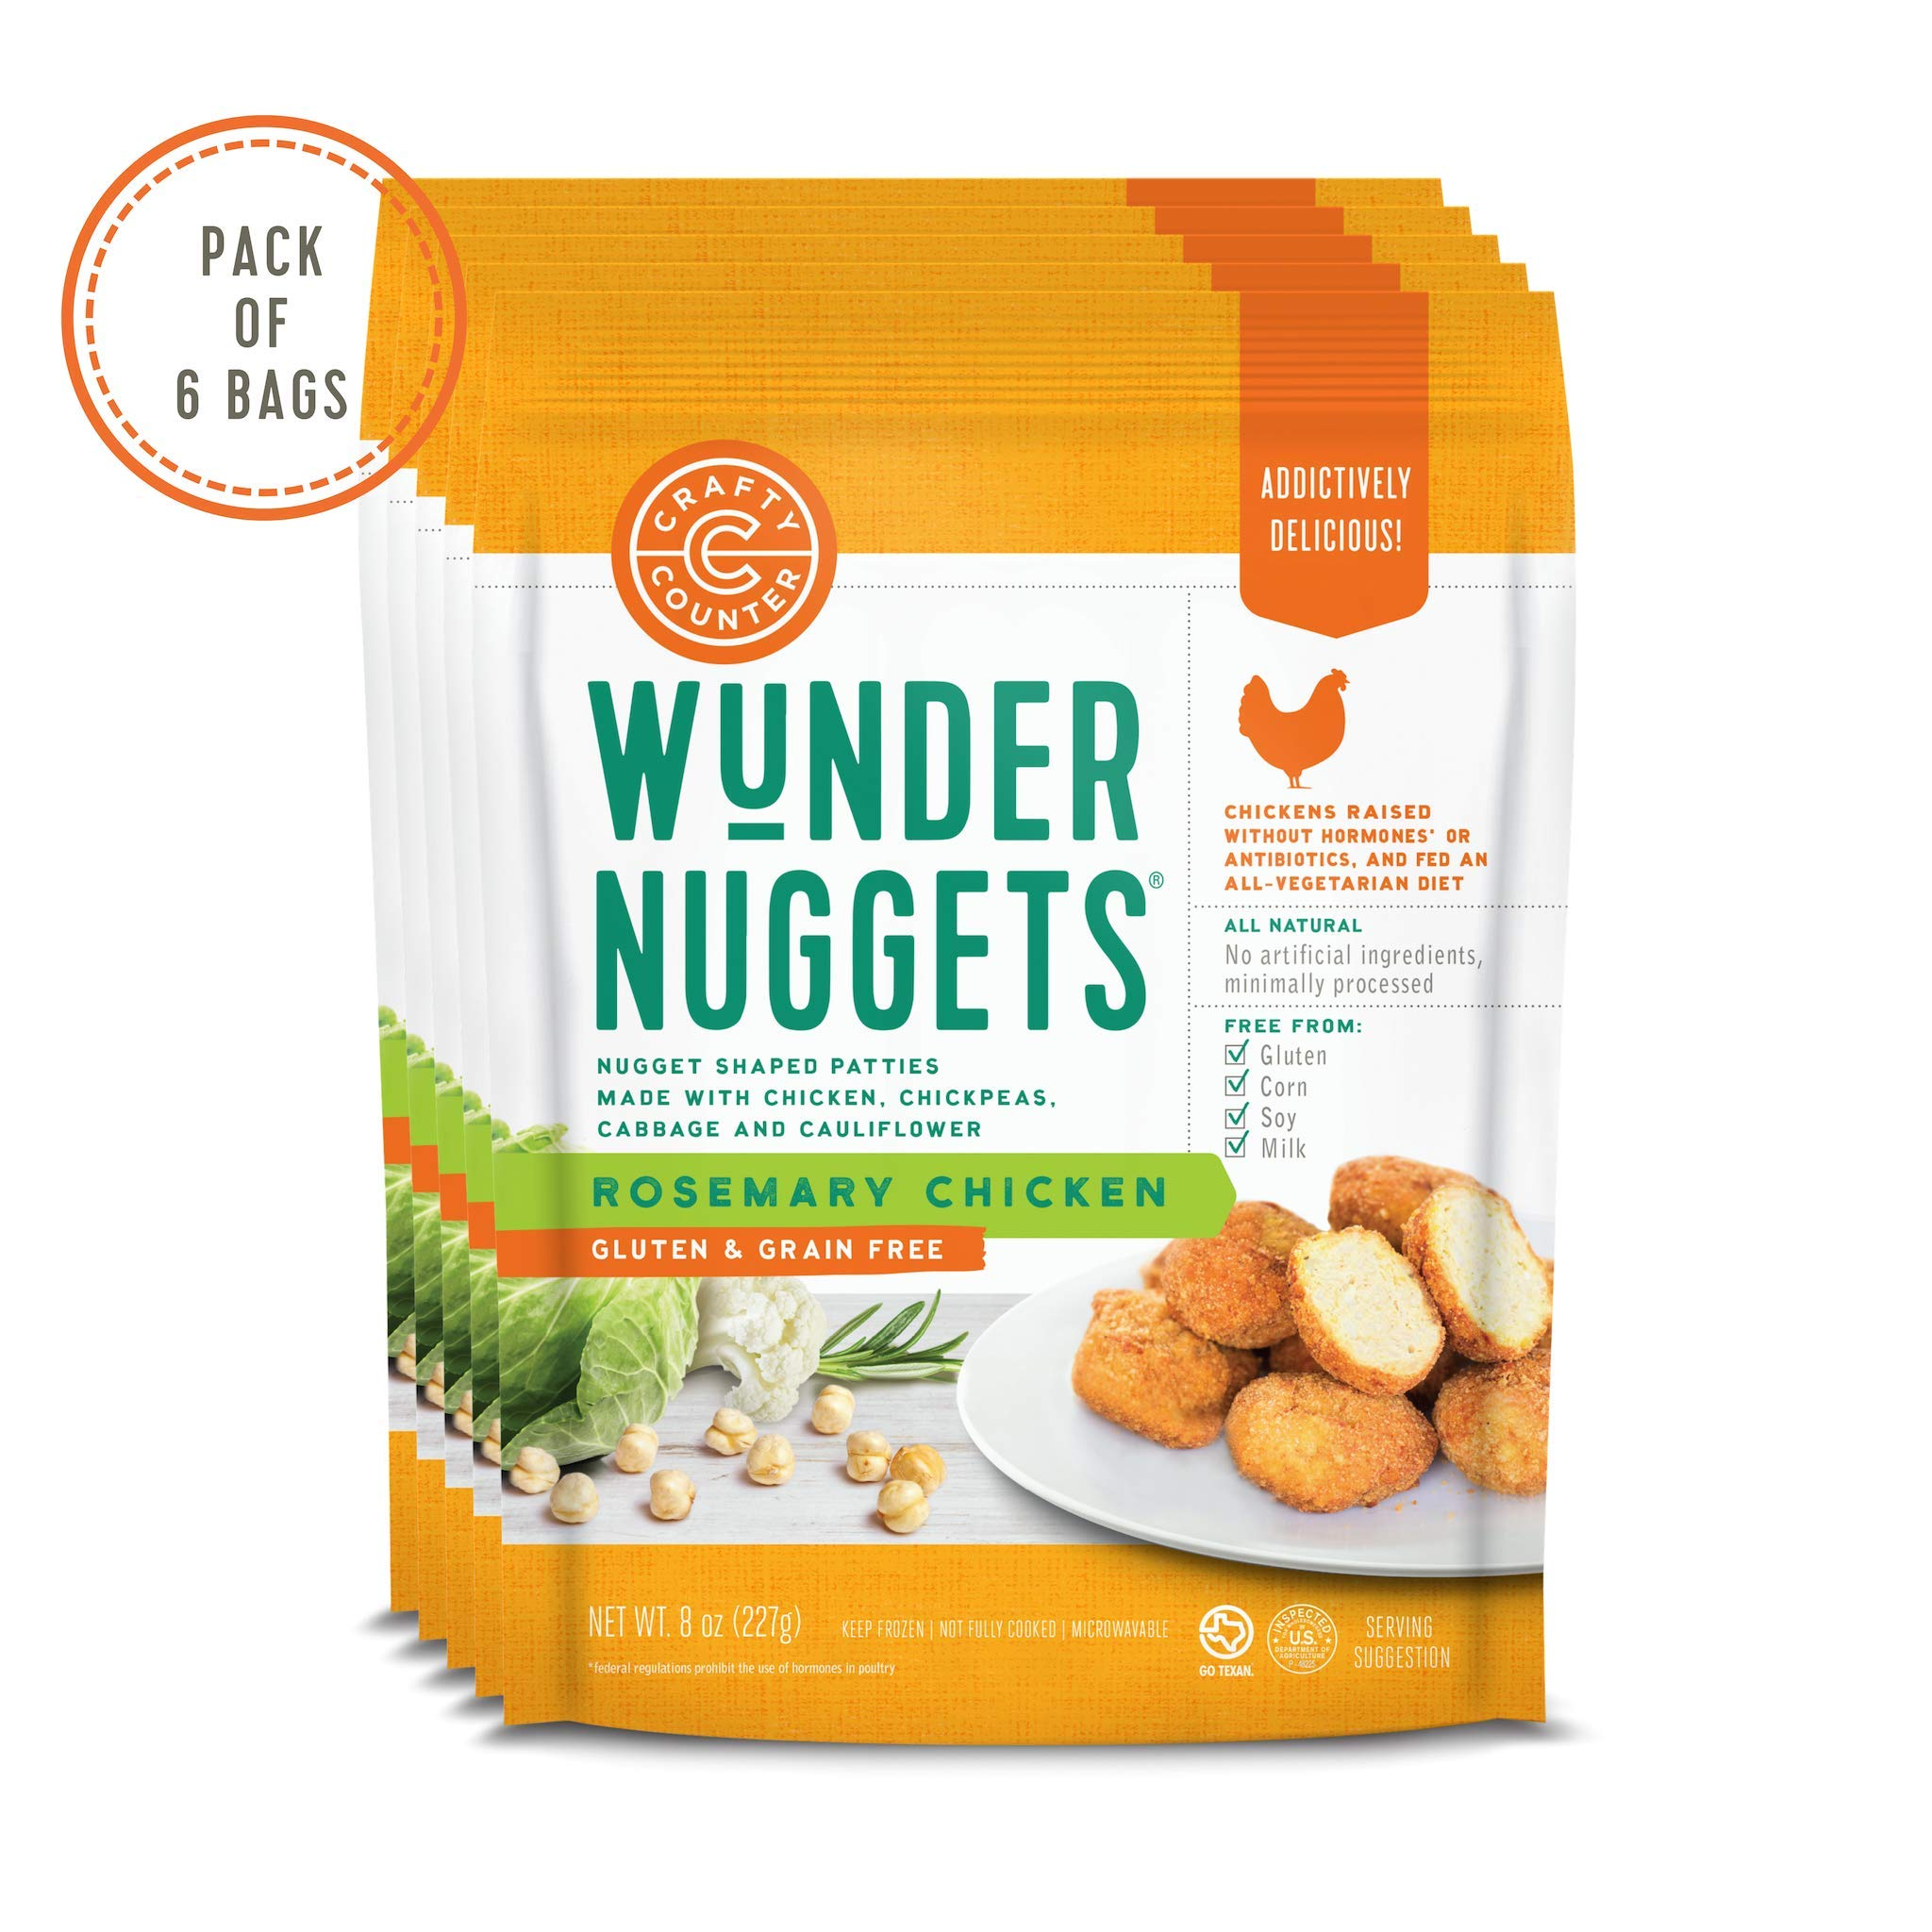 Pack of 6 Bags - Gluten & Grain Free Rosemary Chicken Wundernuggets